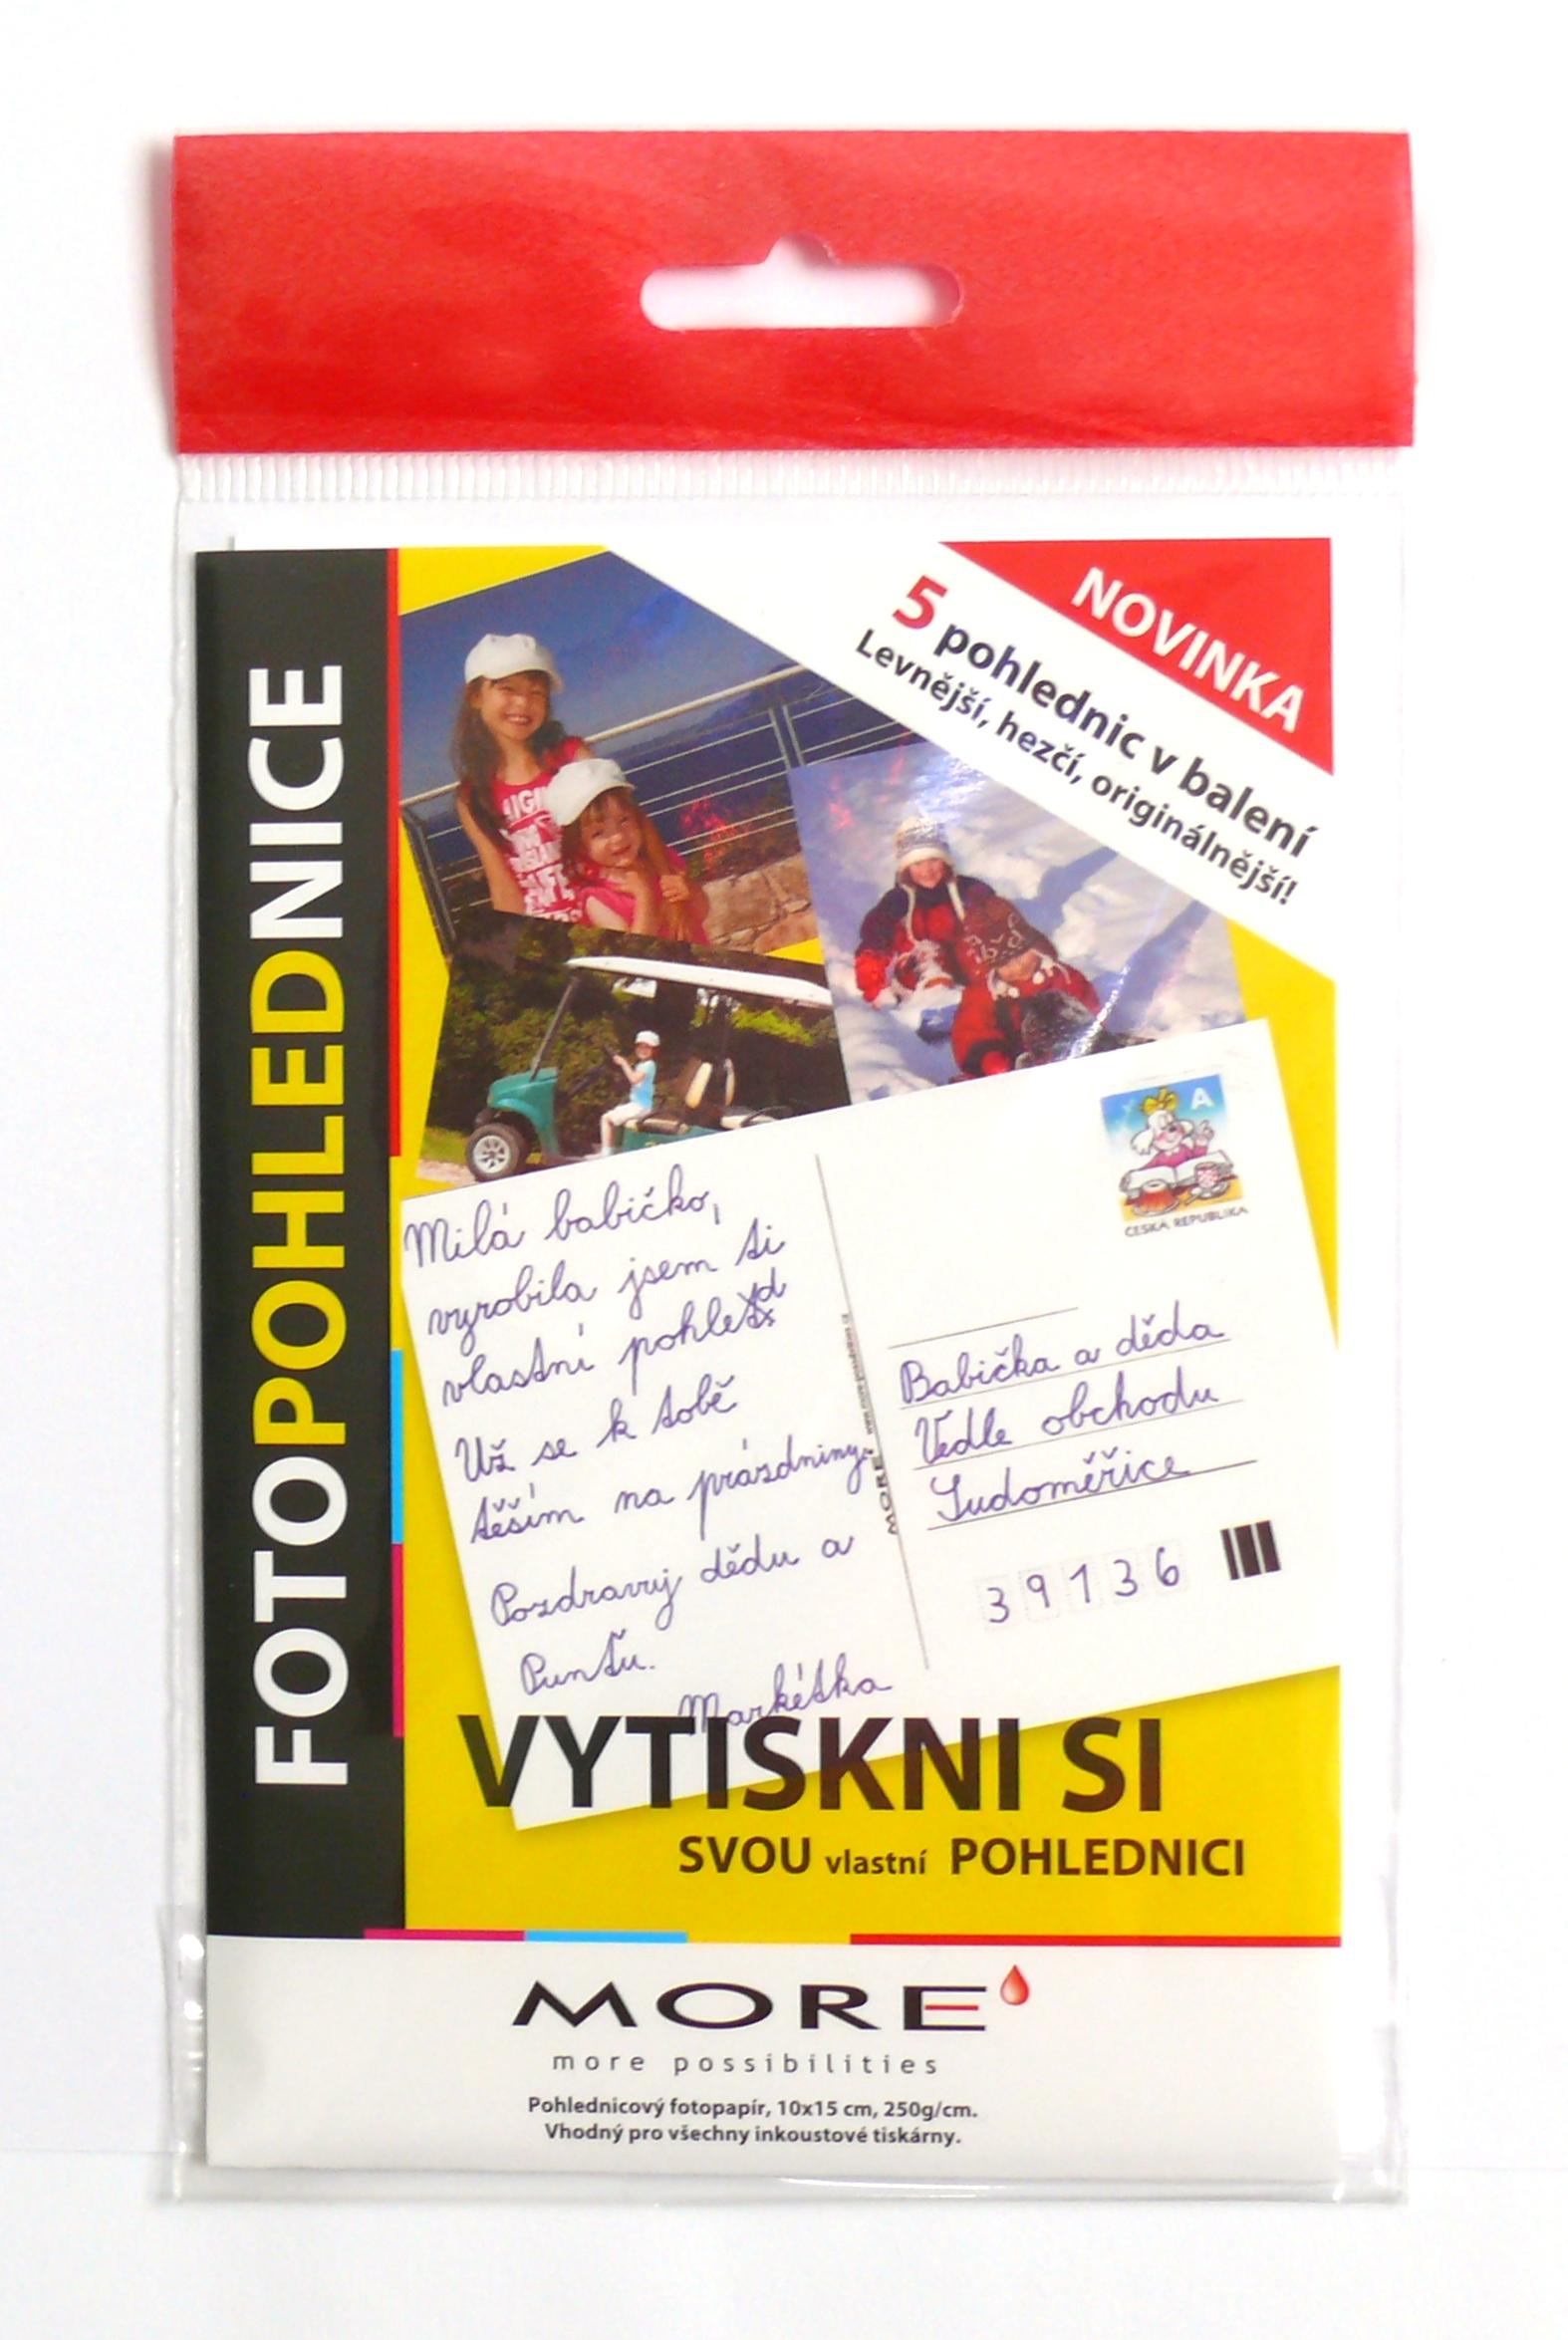 Fotopohlednice 250g/m2, 10x15 cm, glossy, 5ks/bal - M10562